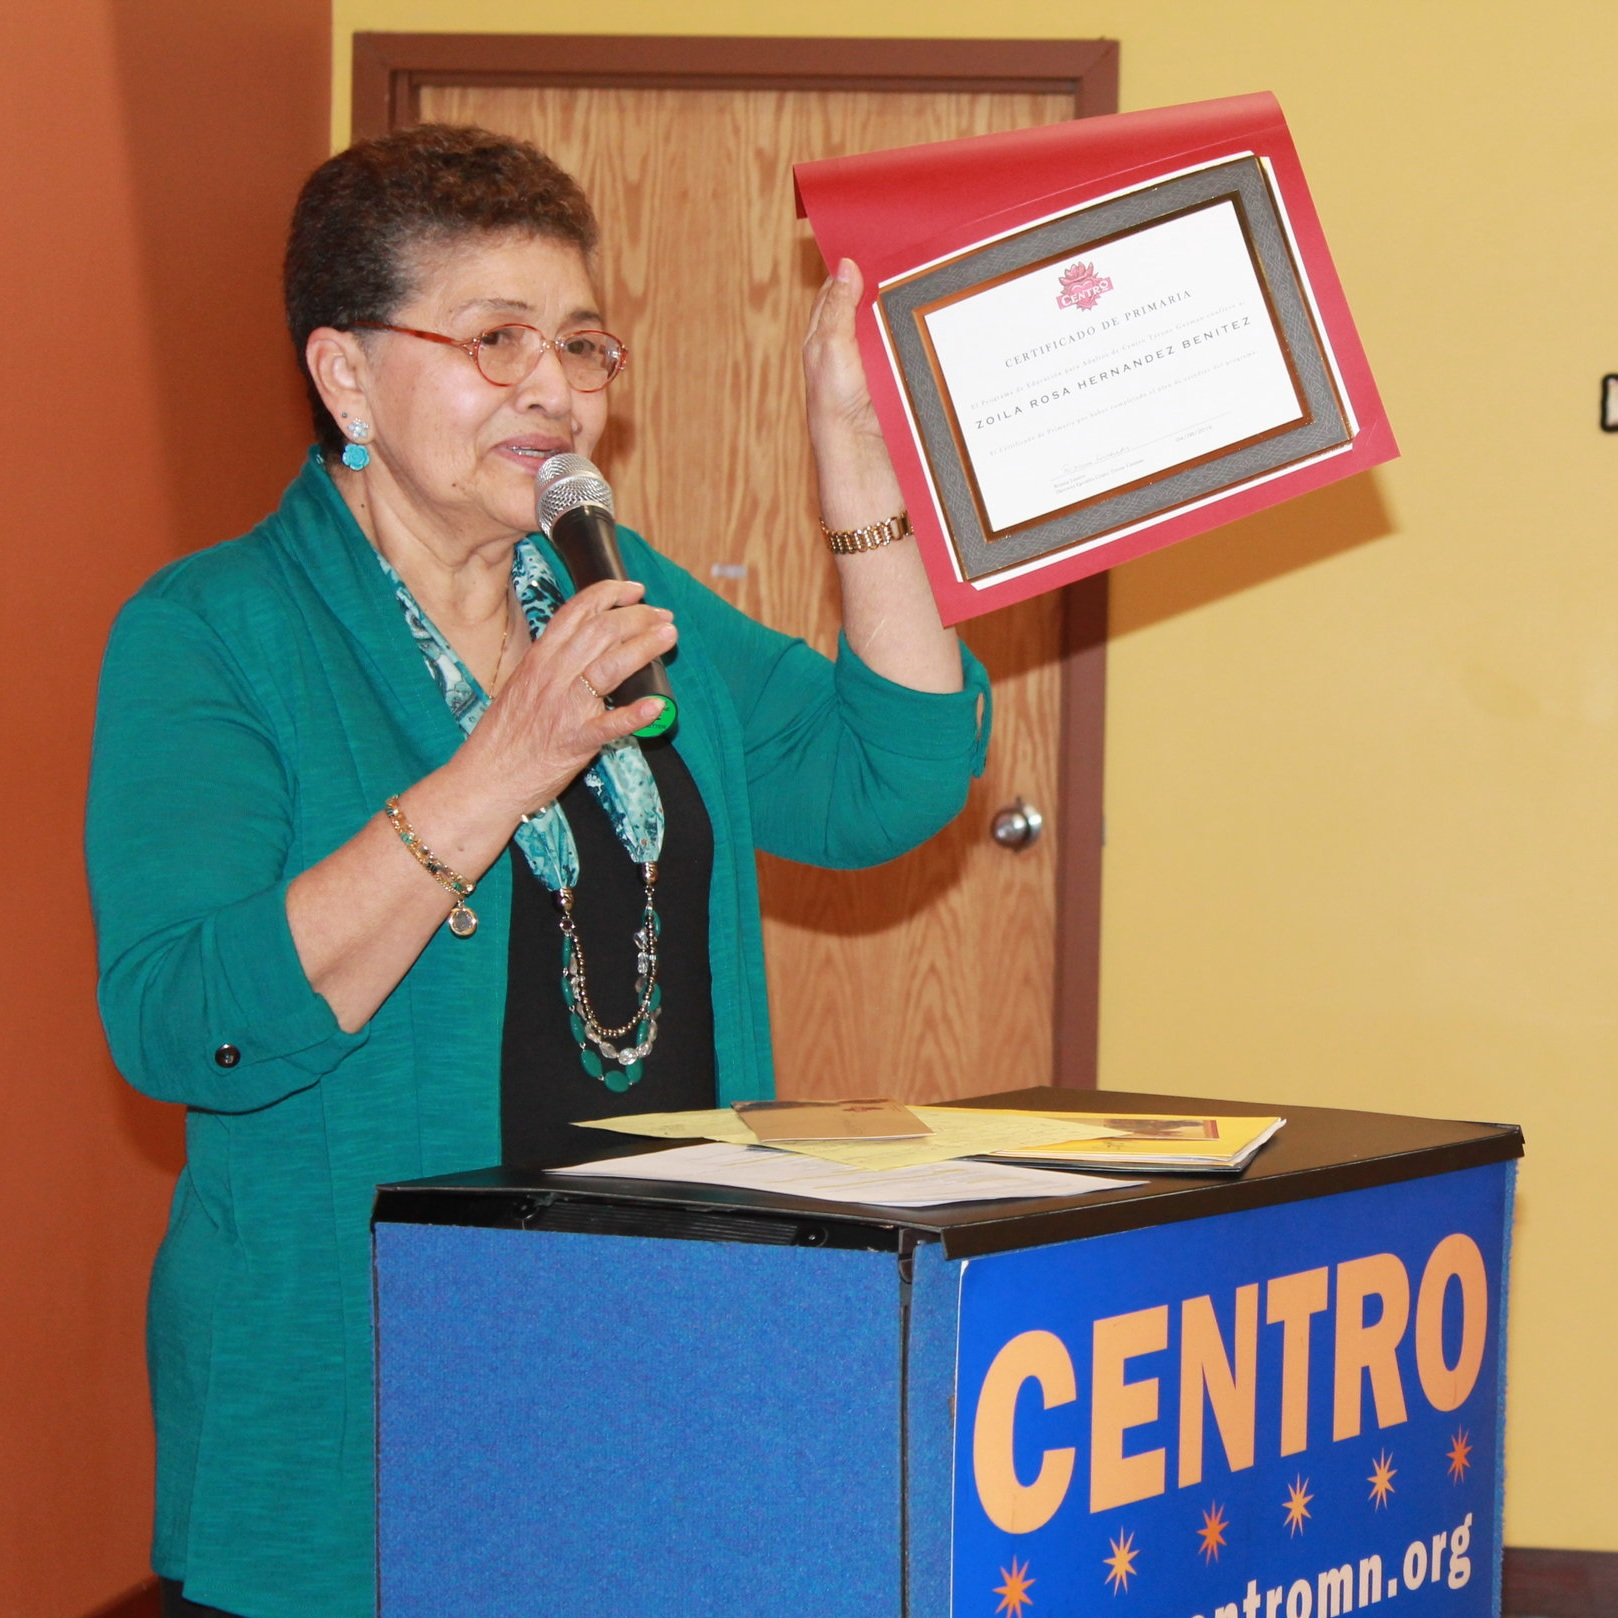 Photo caption: Adult Literacy participant receiving her graduation diploma.